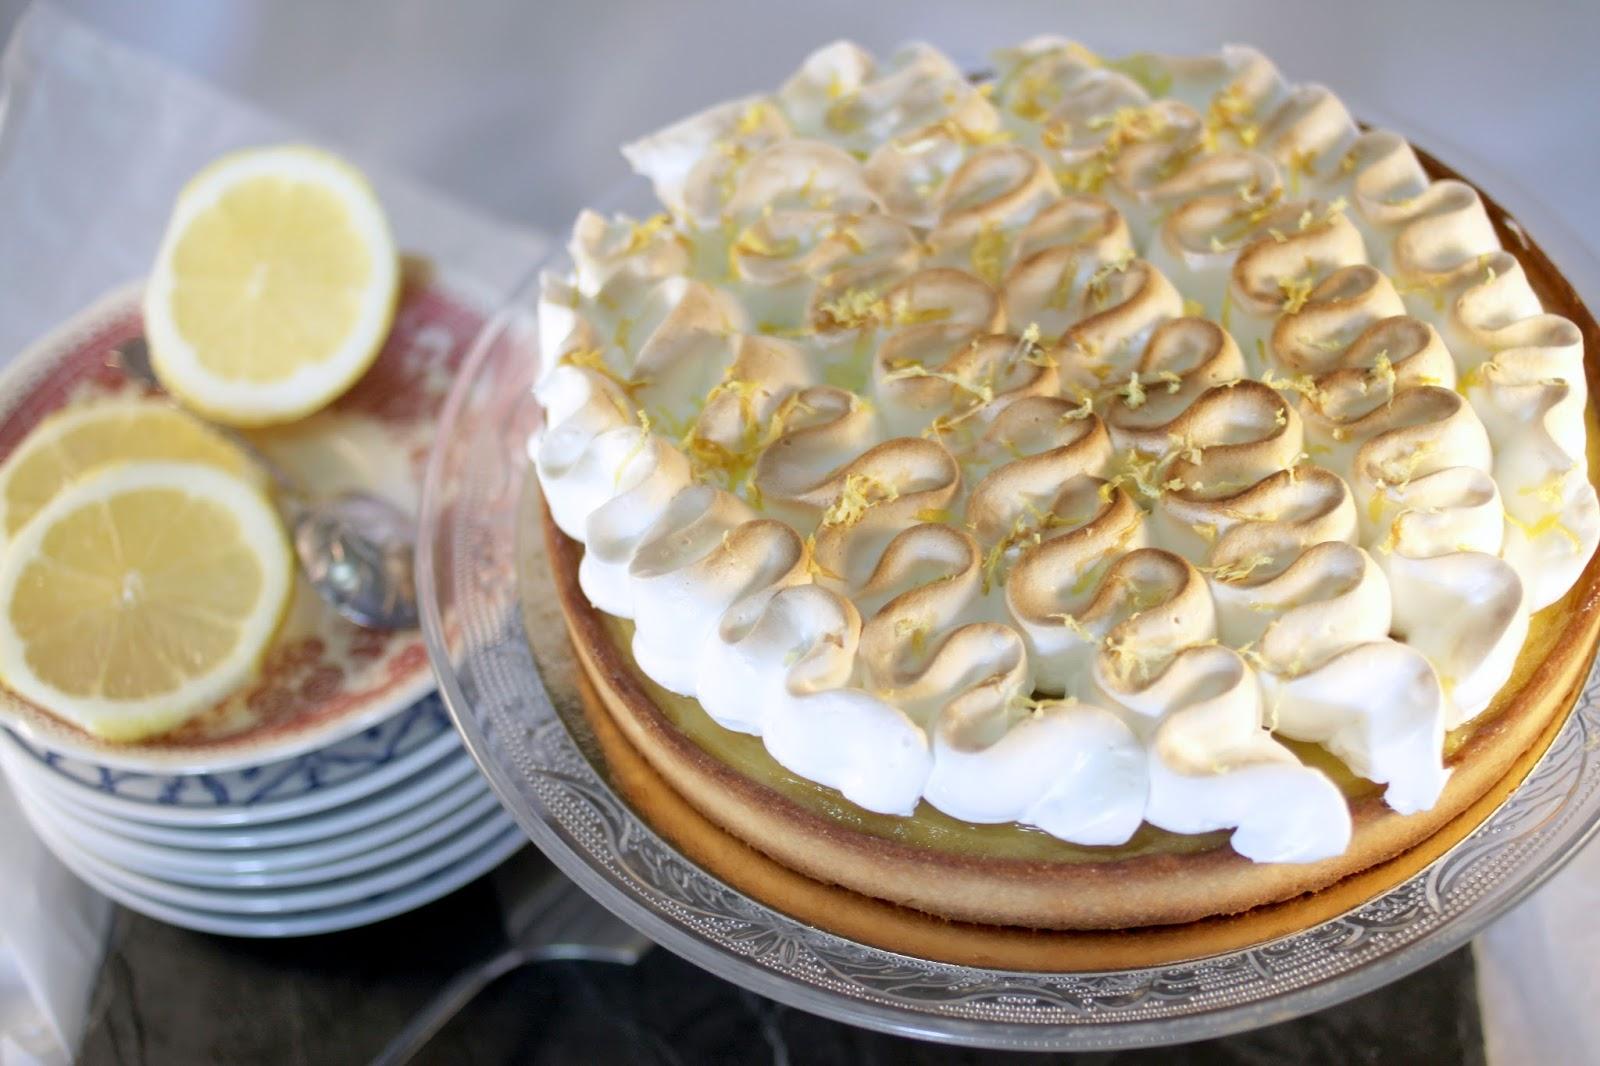 Chlo d lice tarte au citron meringu e - Recette tarte citron meringuee ...